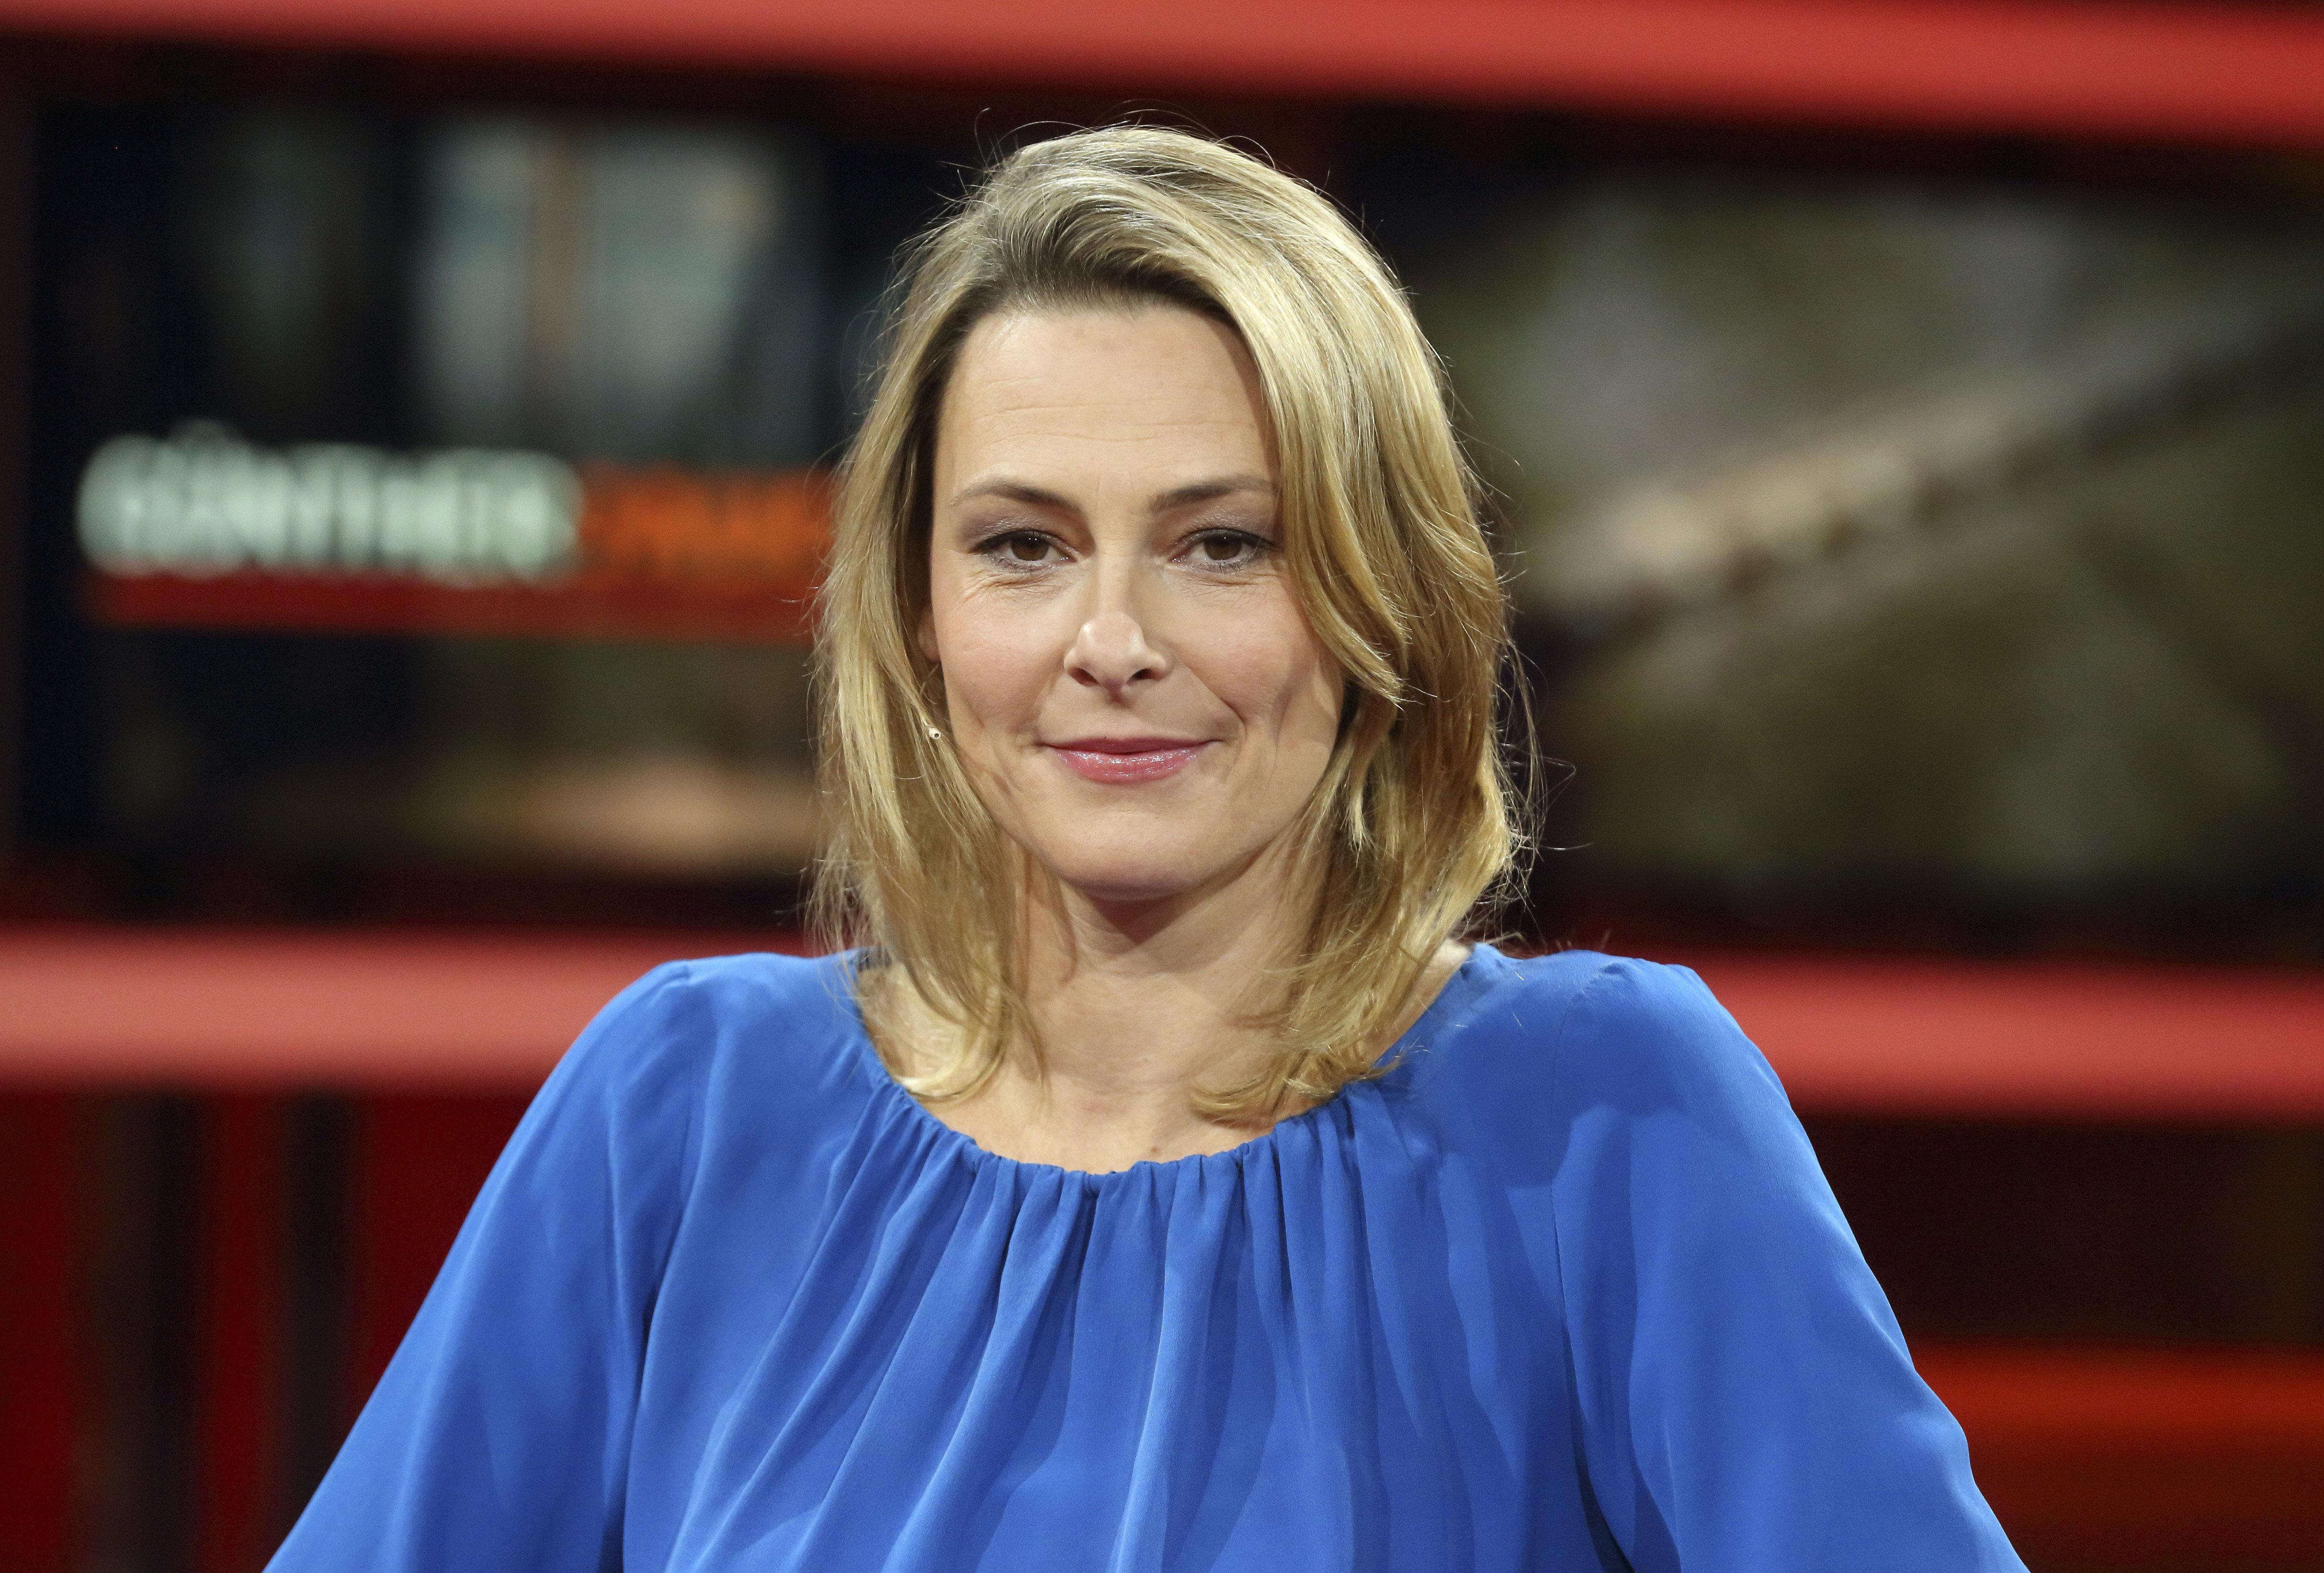 So schonungslos rechnet NDR-Moderatorin Anja Reschke mit dem deutschen Fernsehen